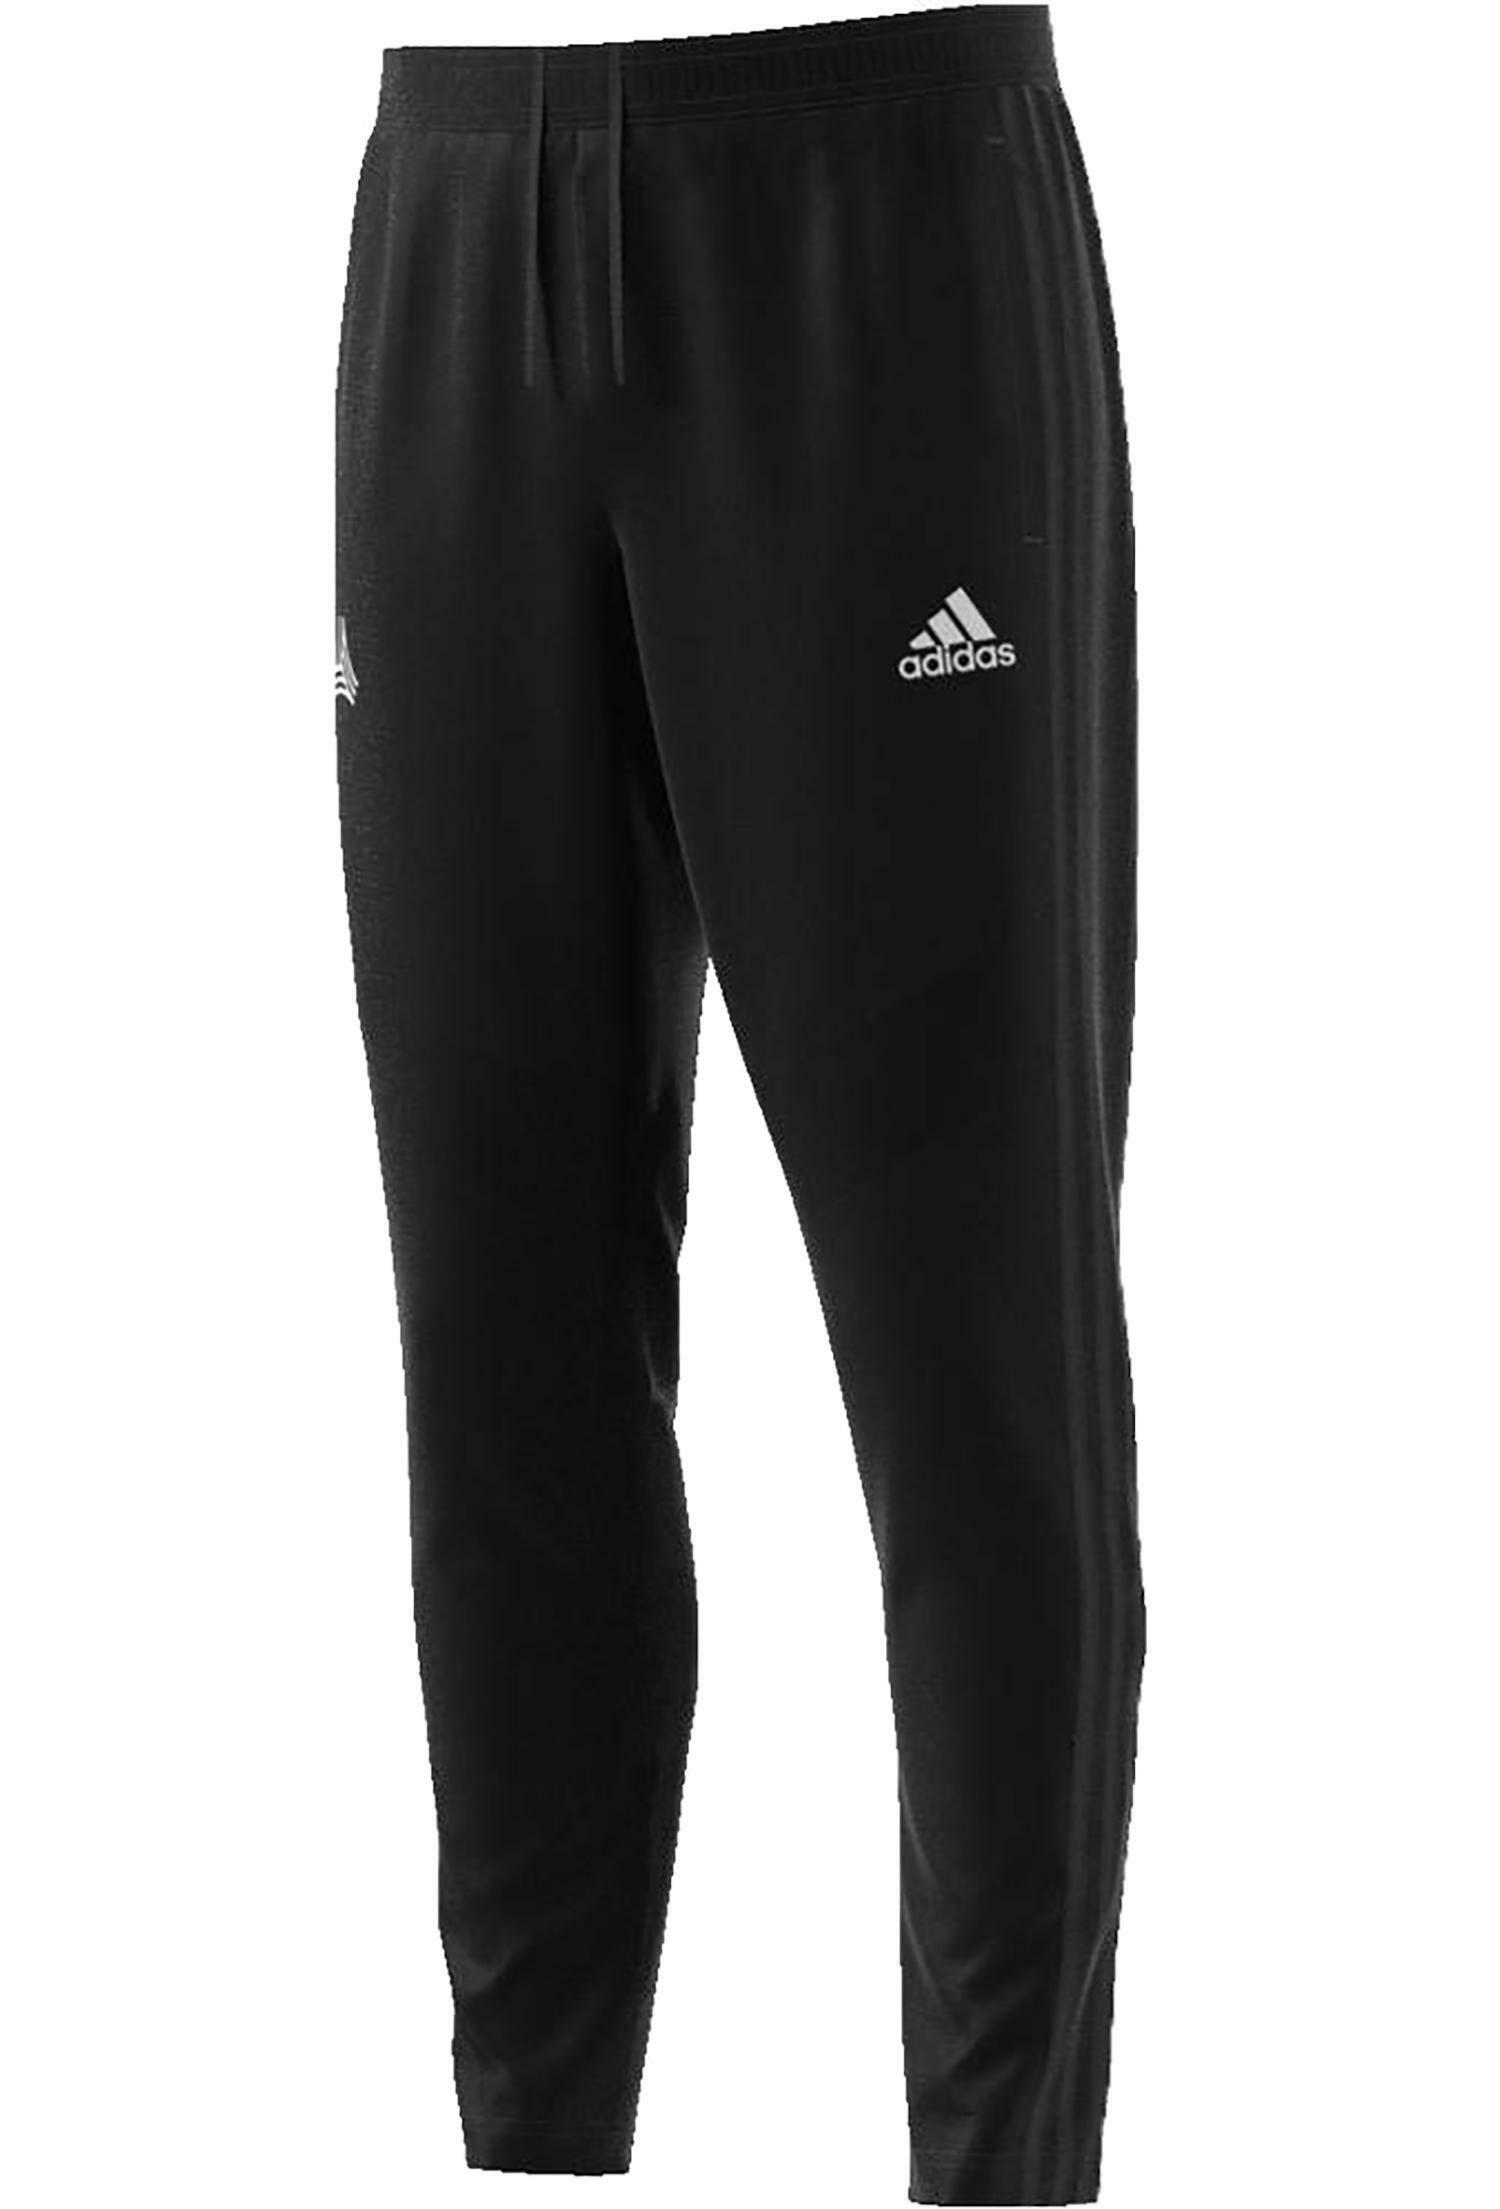 vendita calda online 47be1 2ee06 Adidas tan tr pantaloni tuta uomo neri dt9876